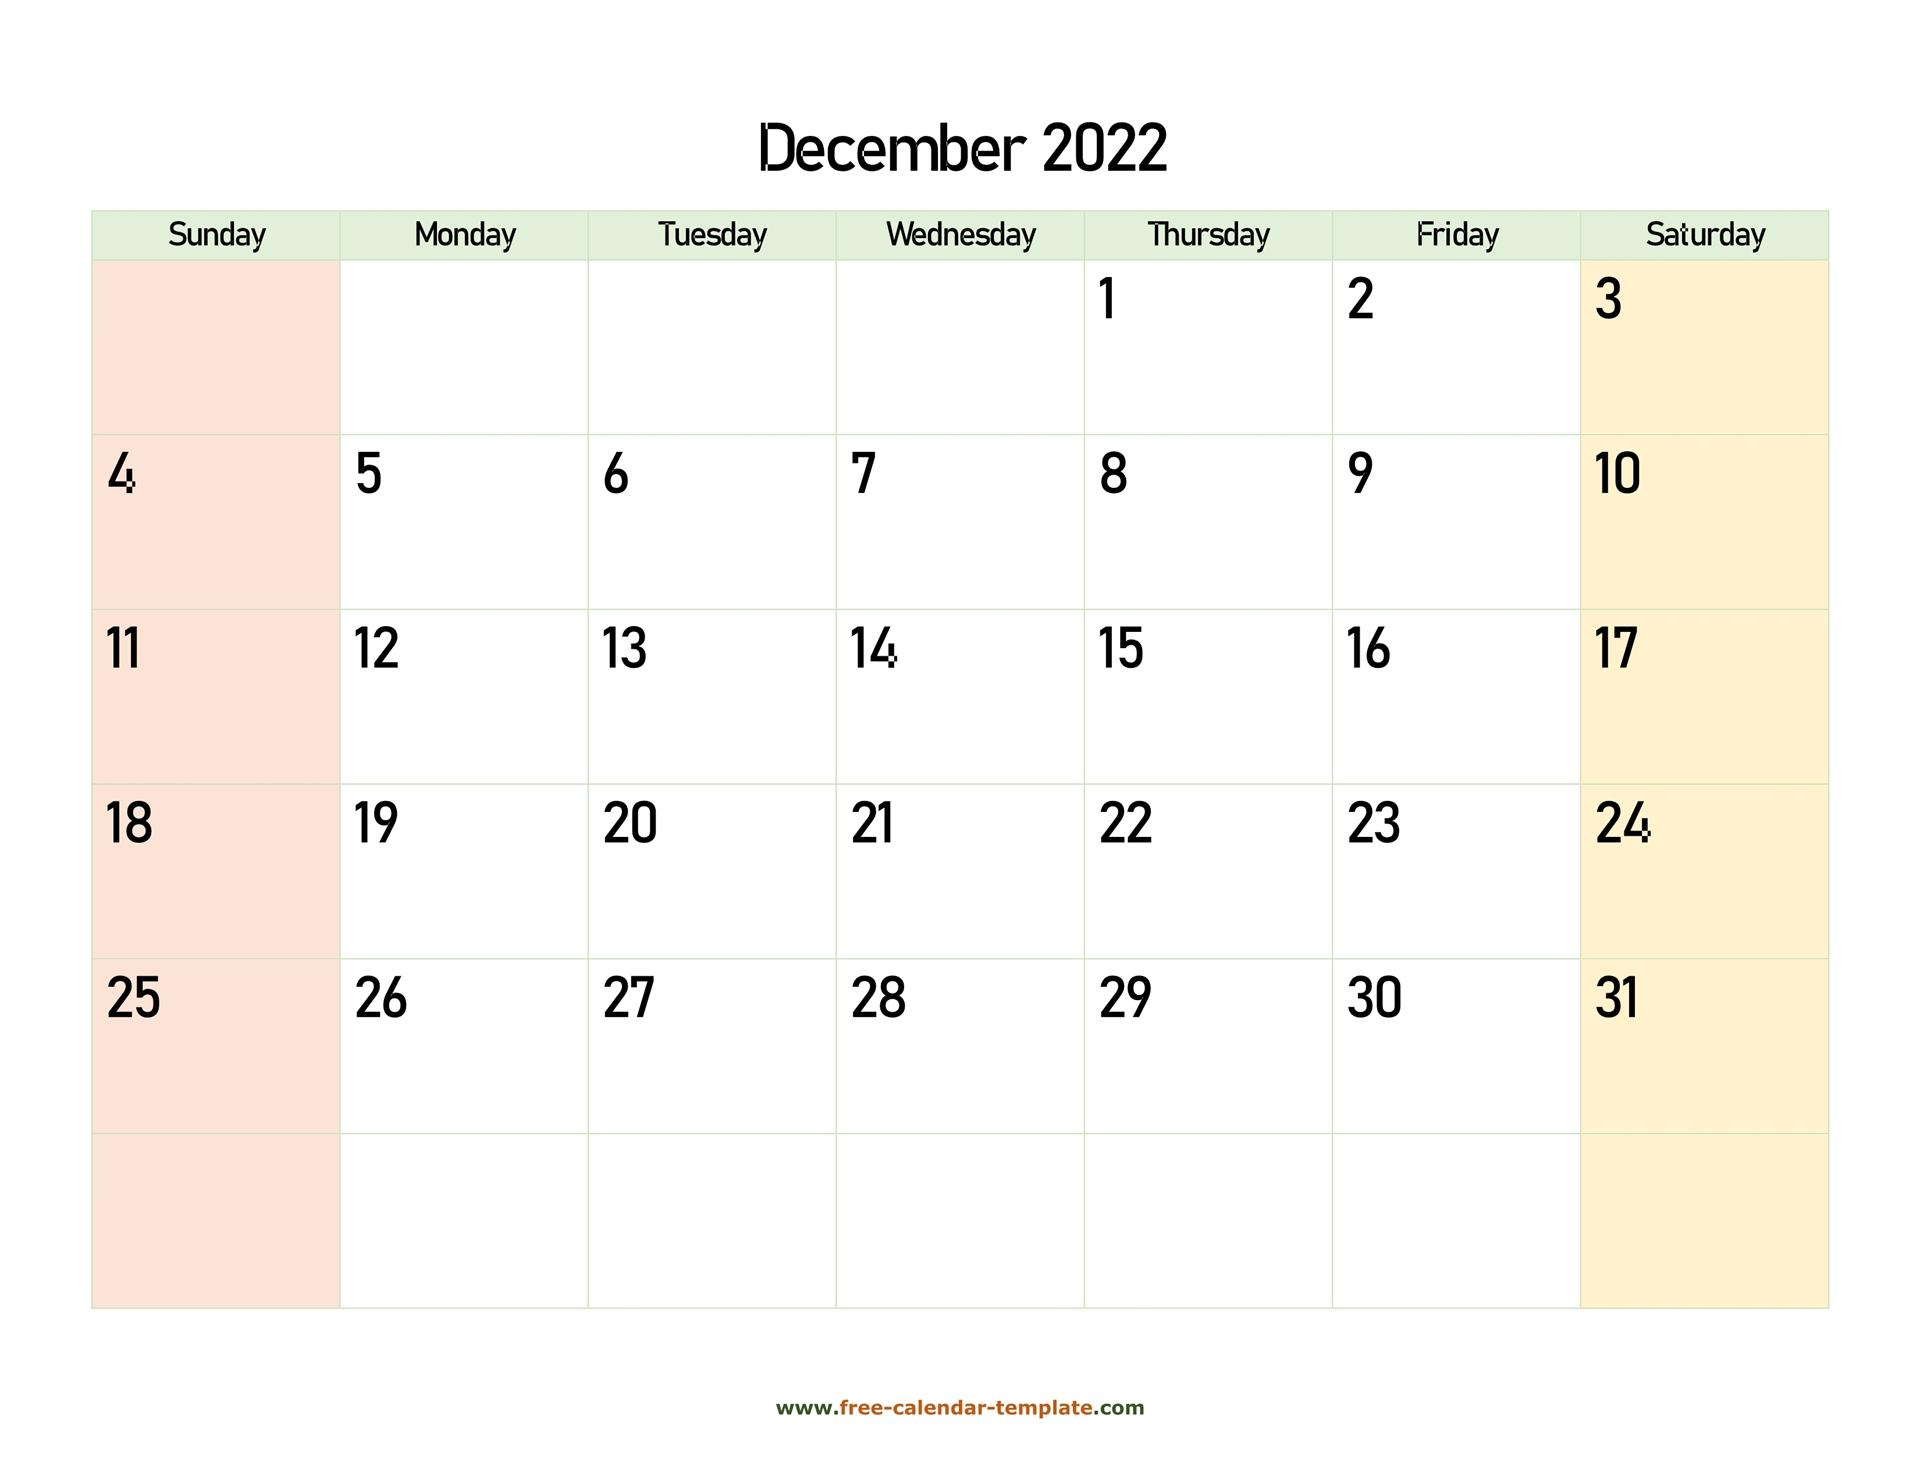 December 2022 Calendar Printable With Coloring On Weekend